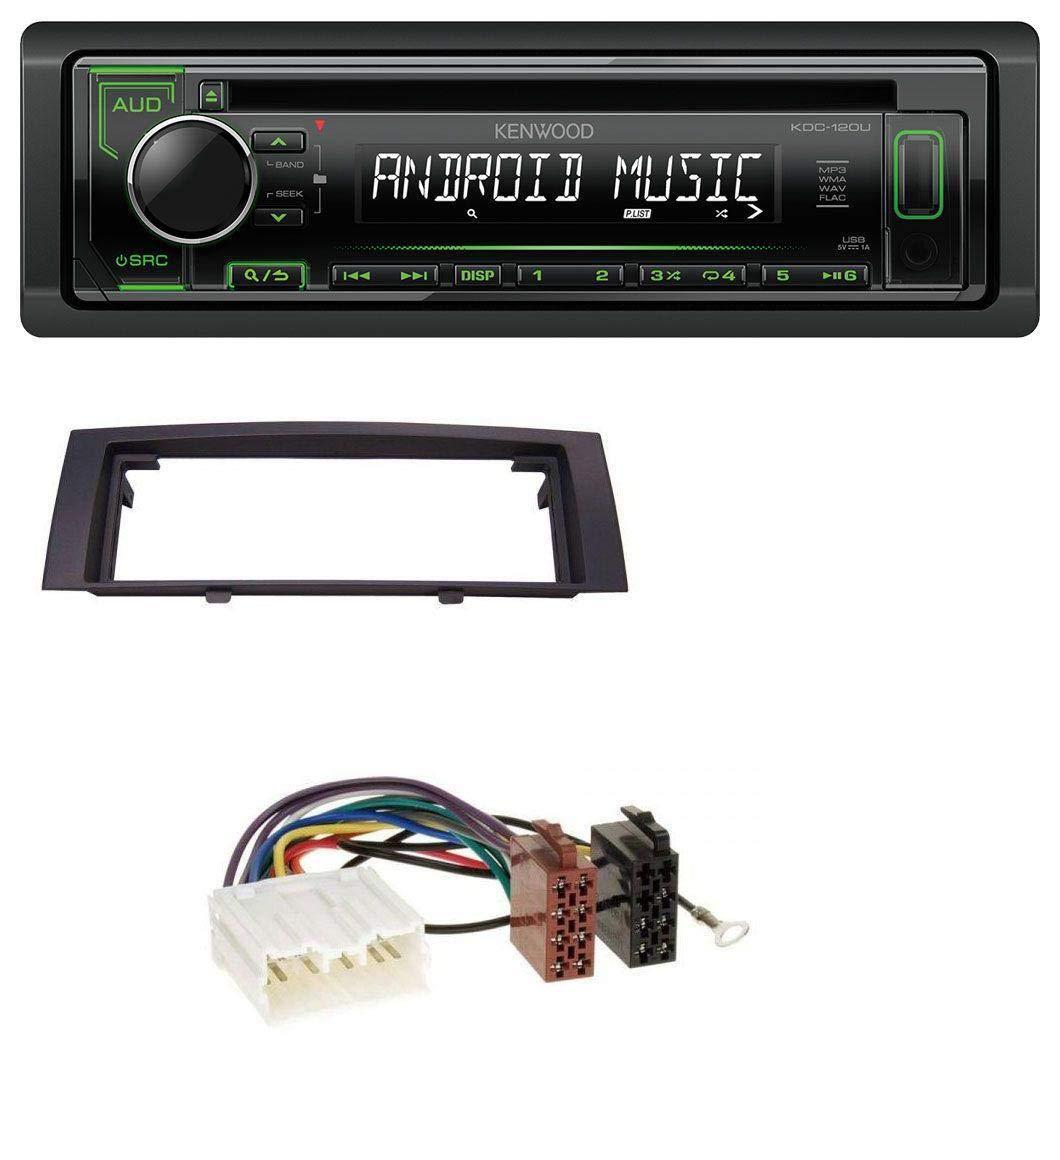 caraudio24 Kenwood KDC-120UG 1DIN USB CD MP3 Aux Autoradio fü r Mitsubishi Colt (2004-2008)